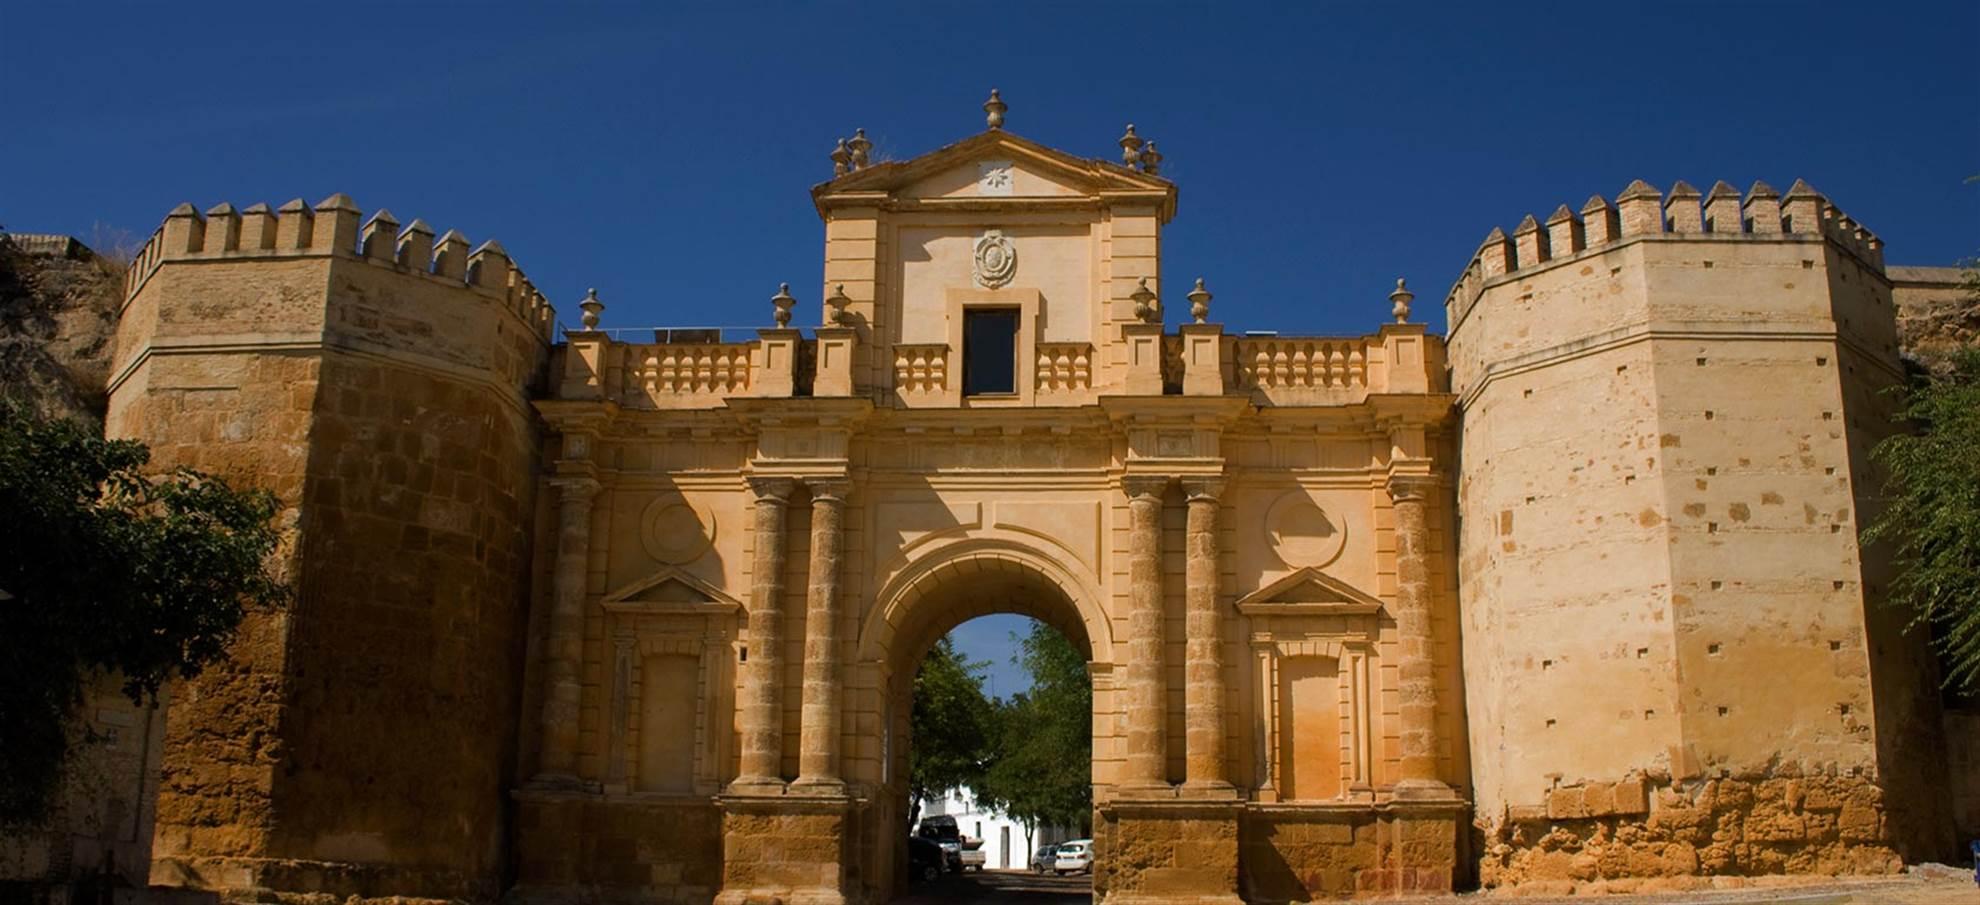 Carmona, wieg van de beschaving (SVQCARMO)